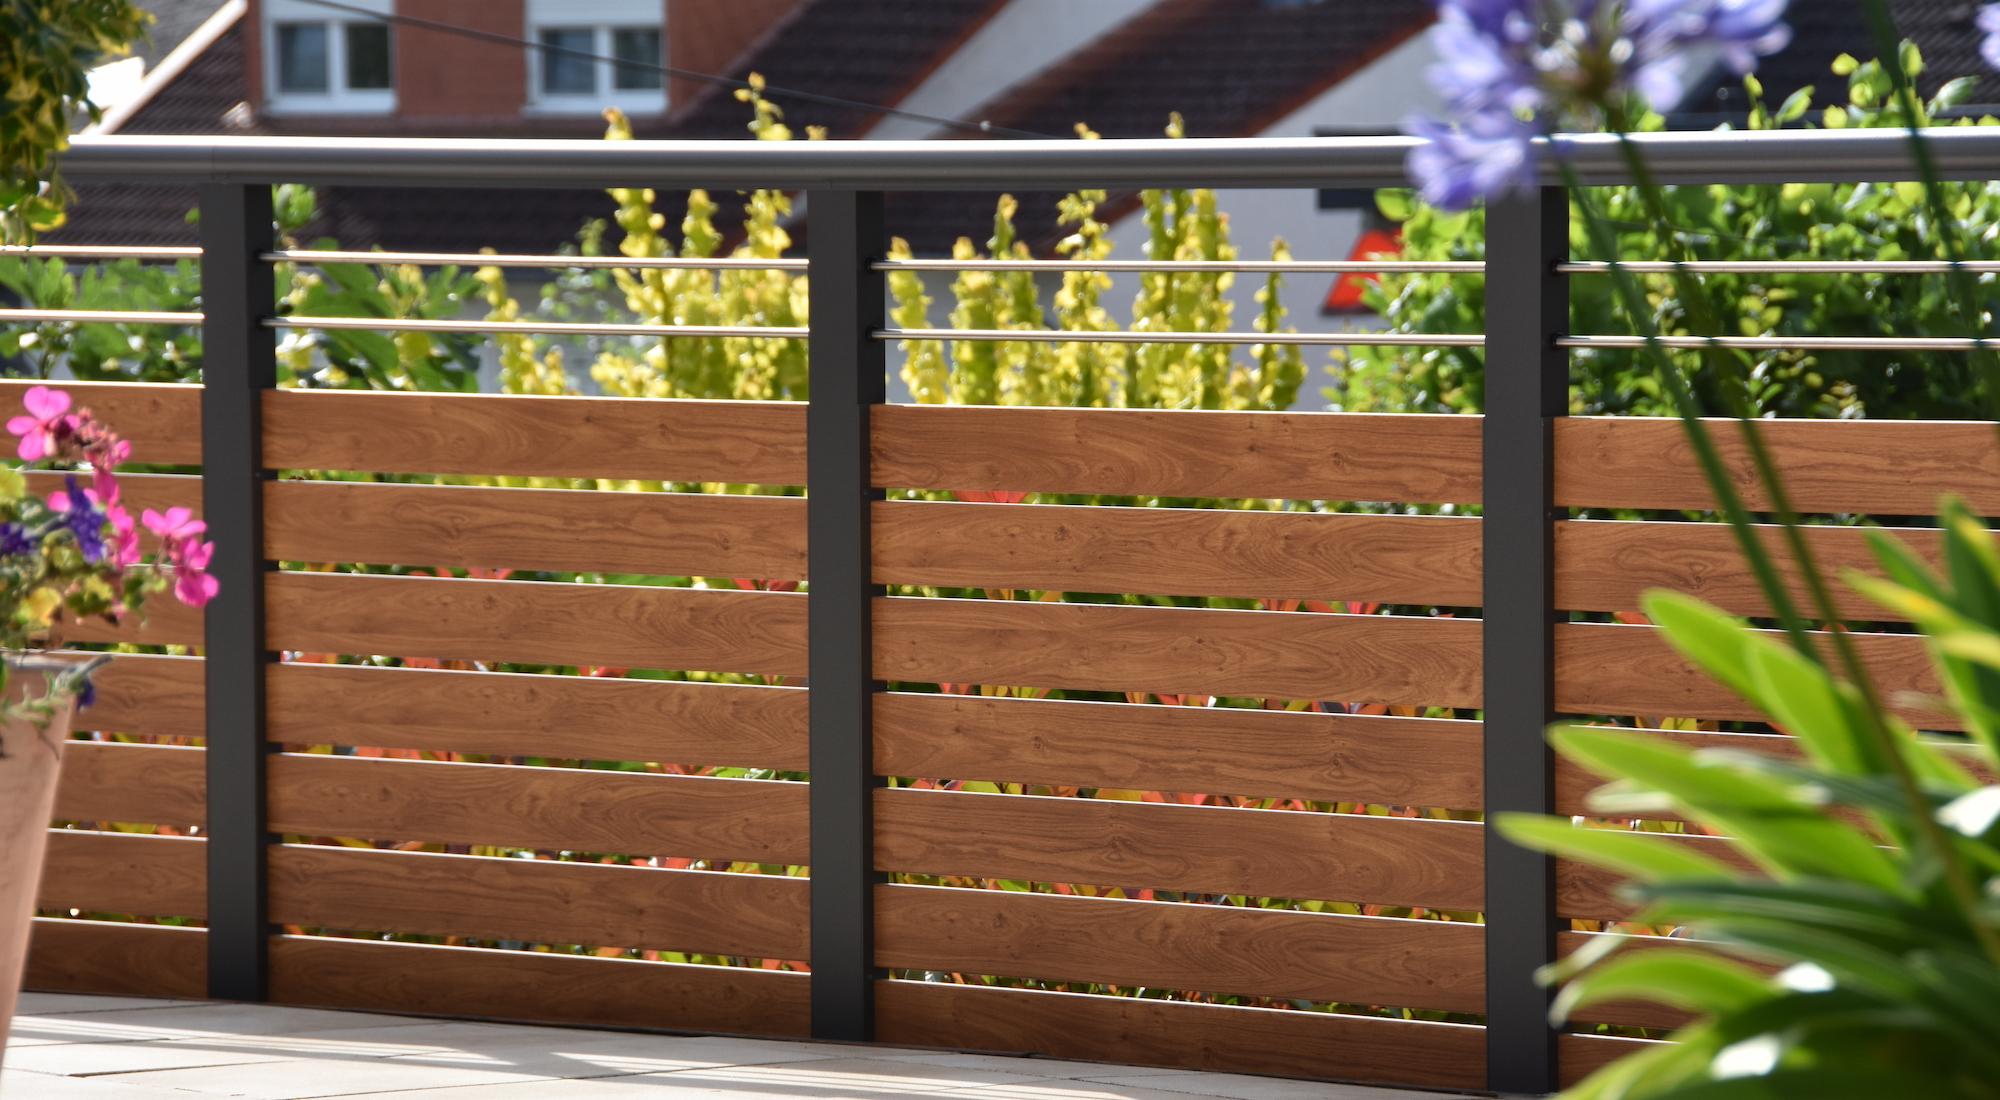 Balkongeländer Holzoptik Aluminium Innenansicht